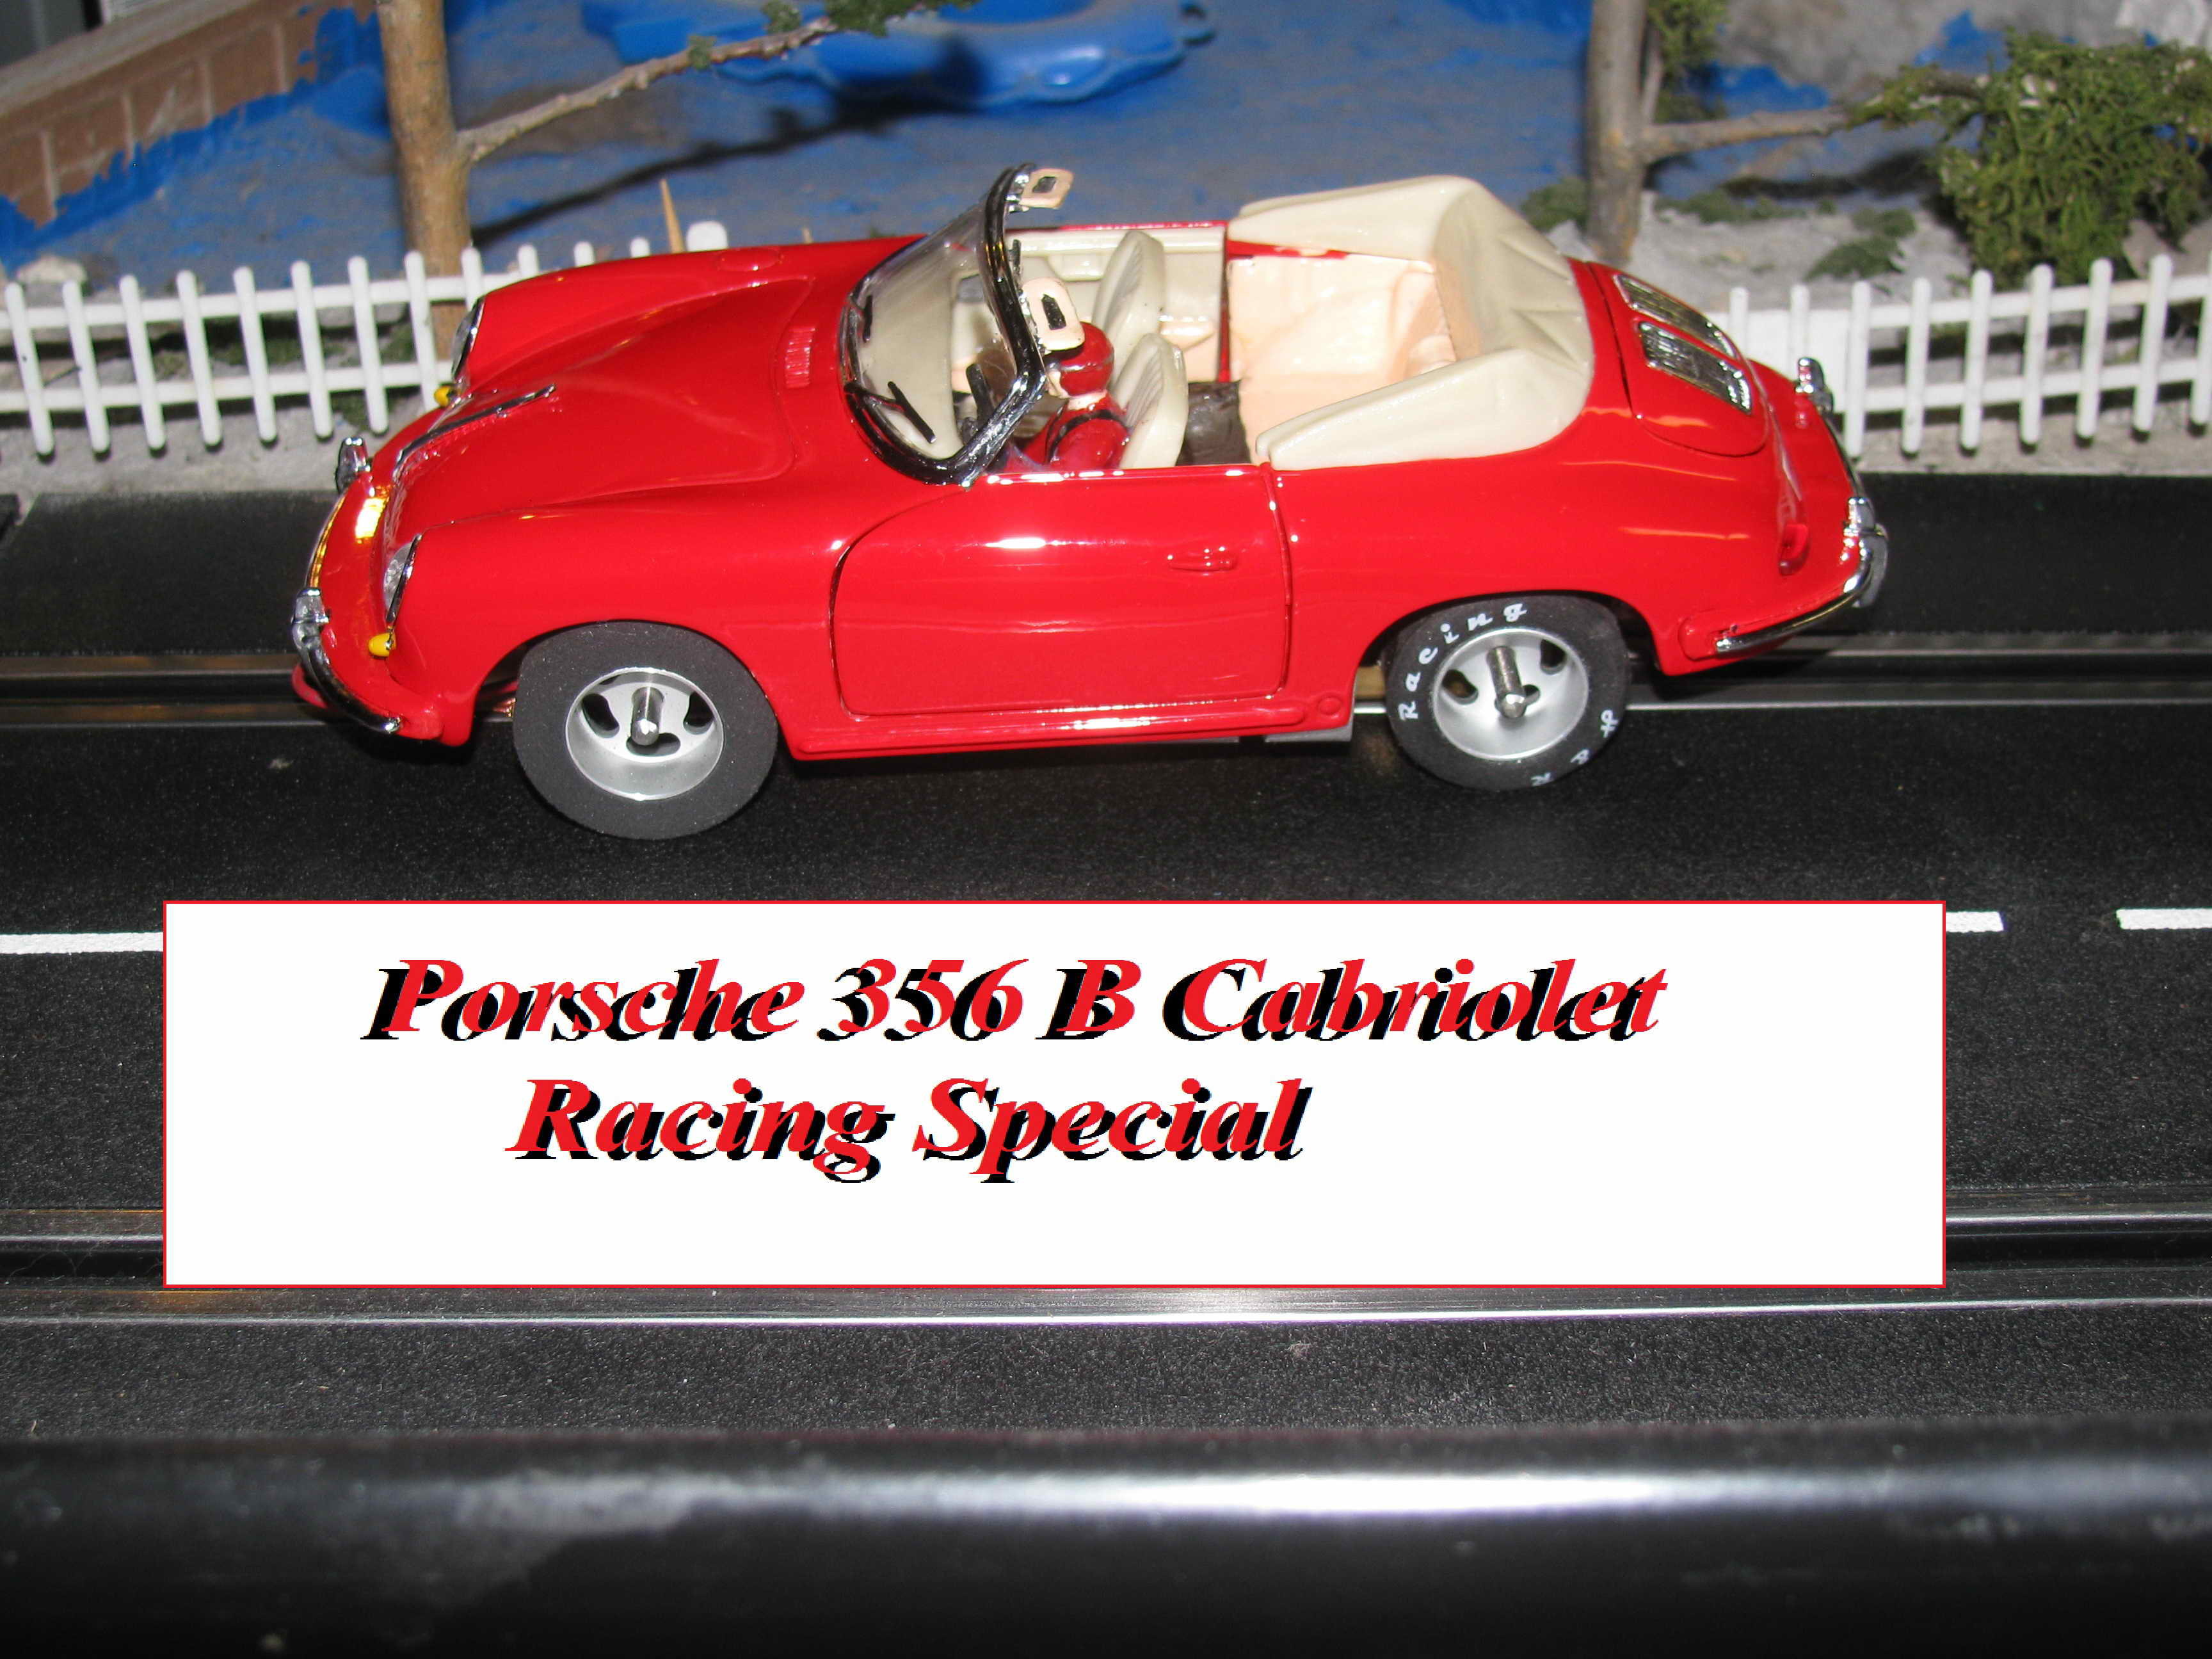 * Super Sale * Porsche 356 B Cabriolet Custom Slot Car Racer with many Modifications 1/24 Scale